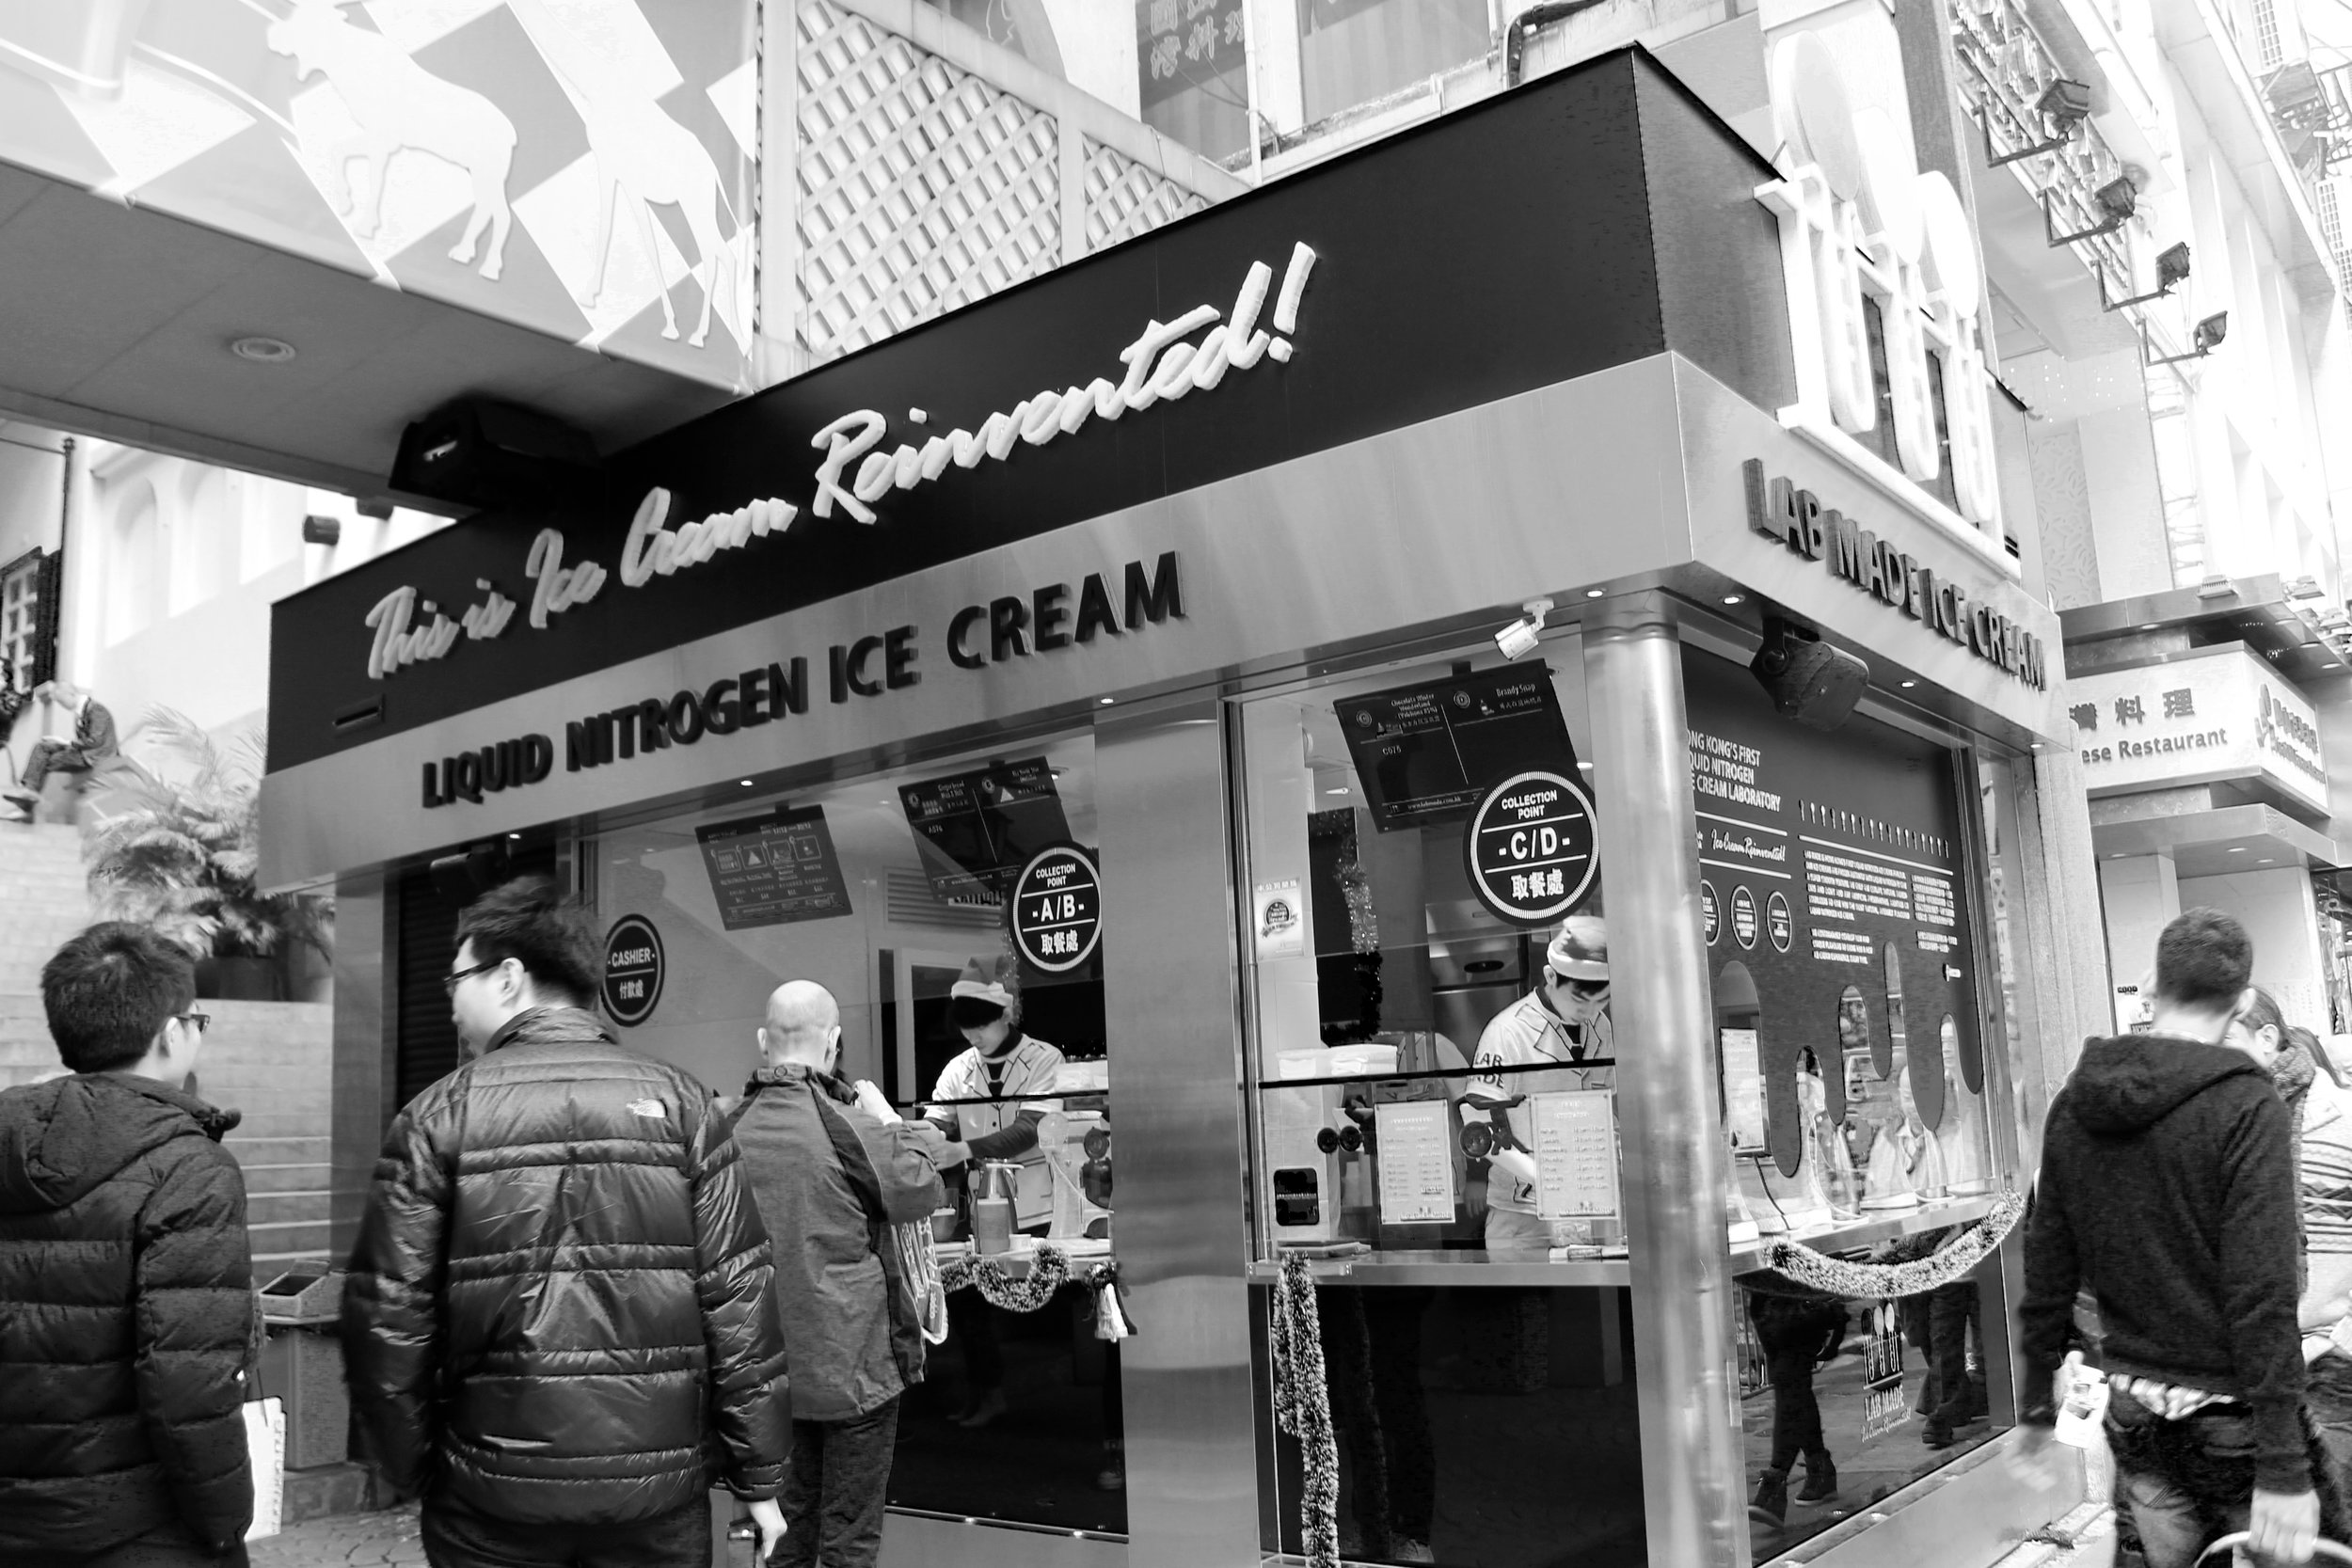 lab-made-ice-cream-hong-kong-01.jpg